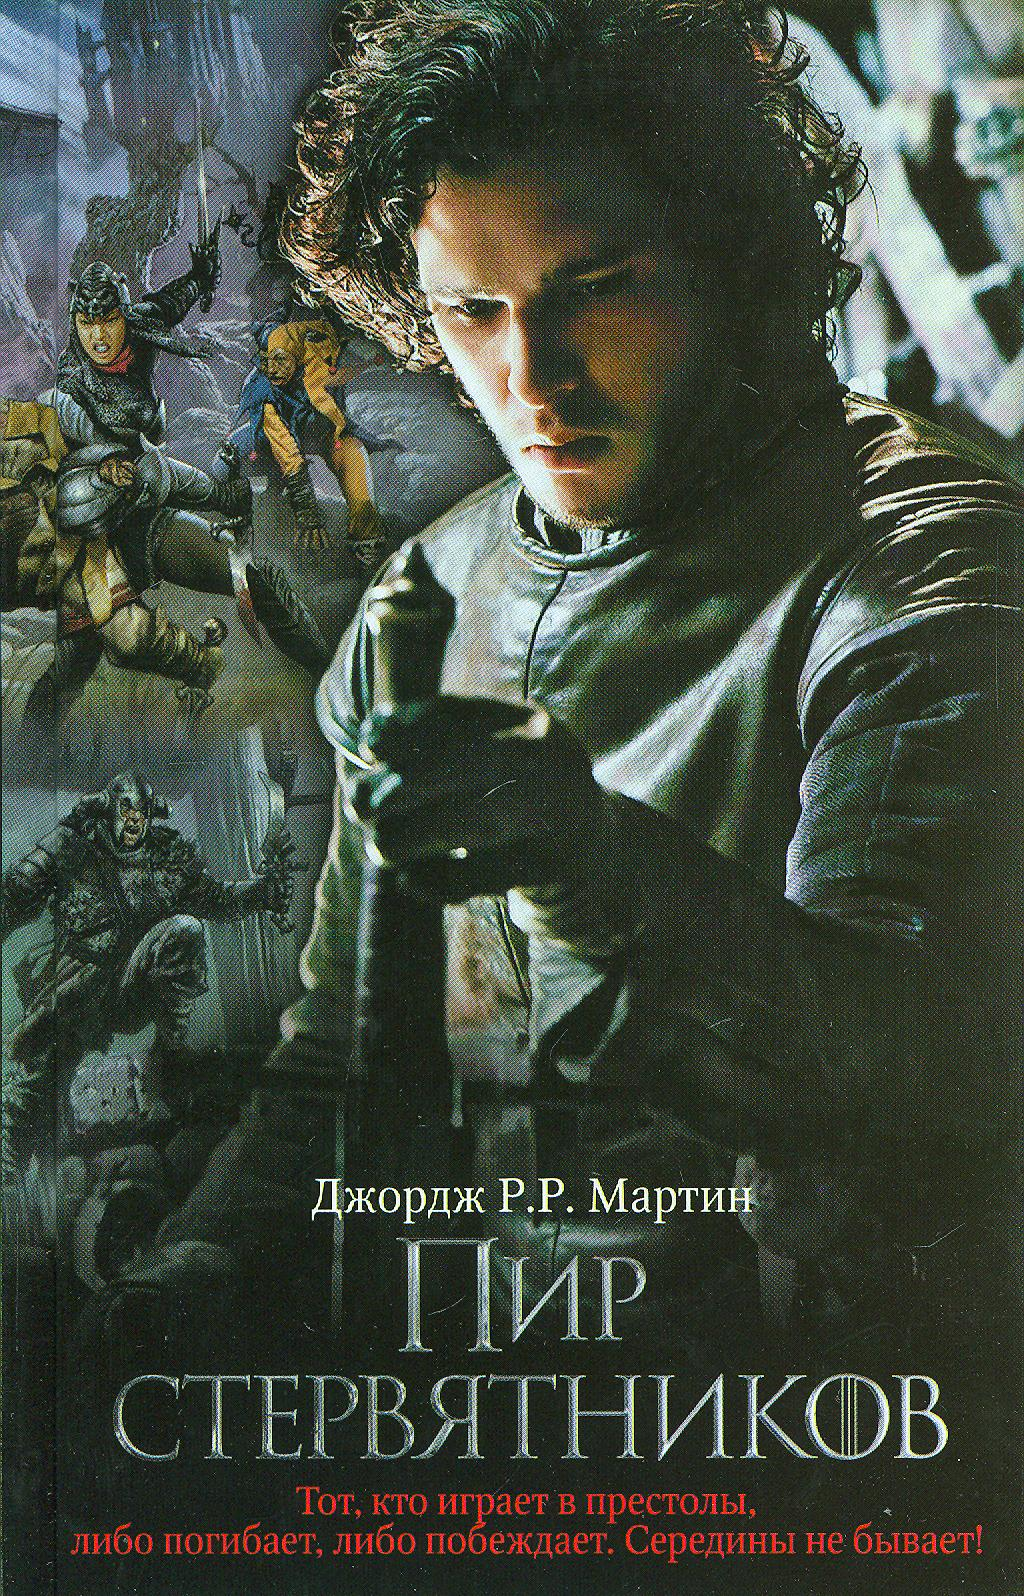 http://www.rostovkniga.com/assets/images/kartinki/422426.jpg